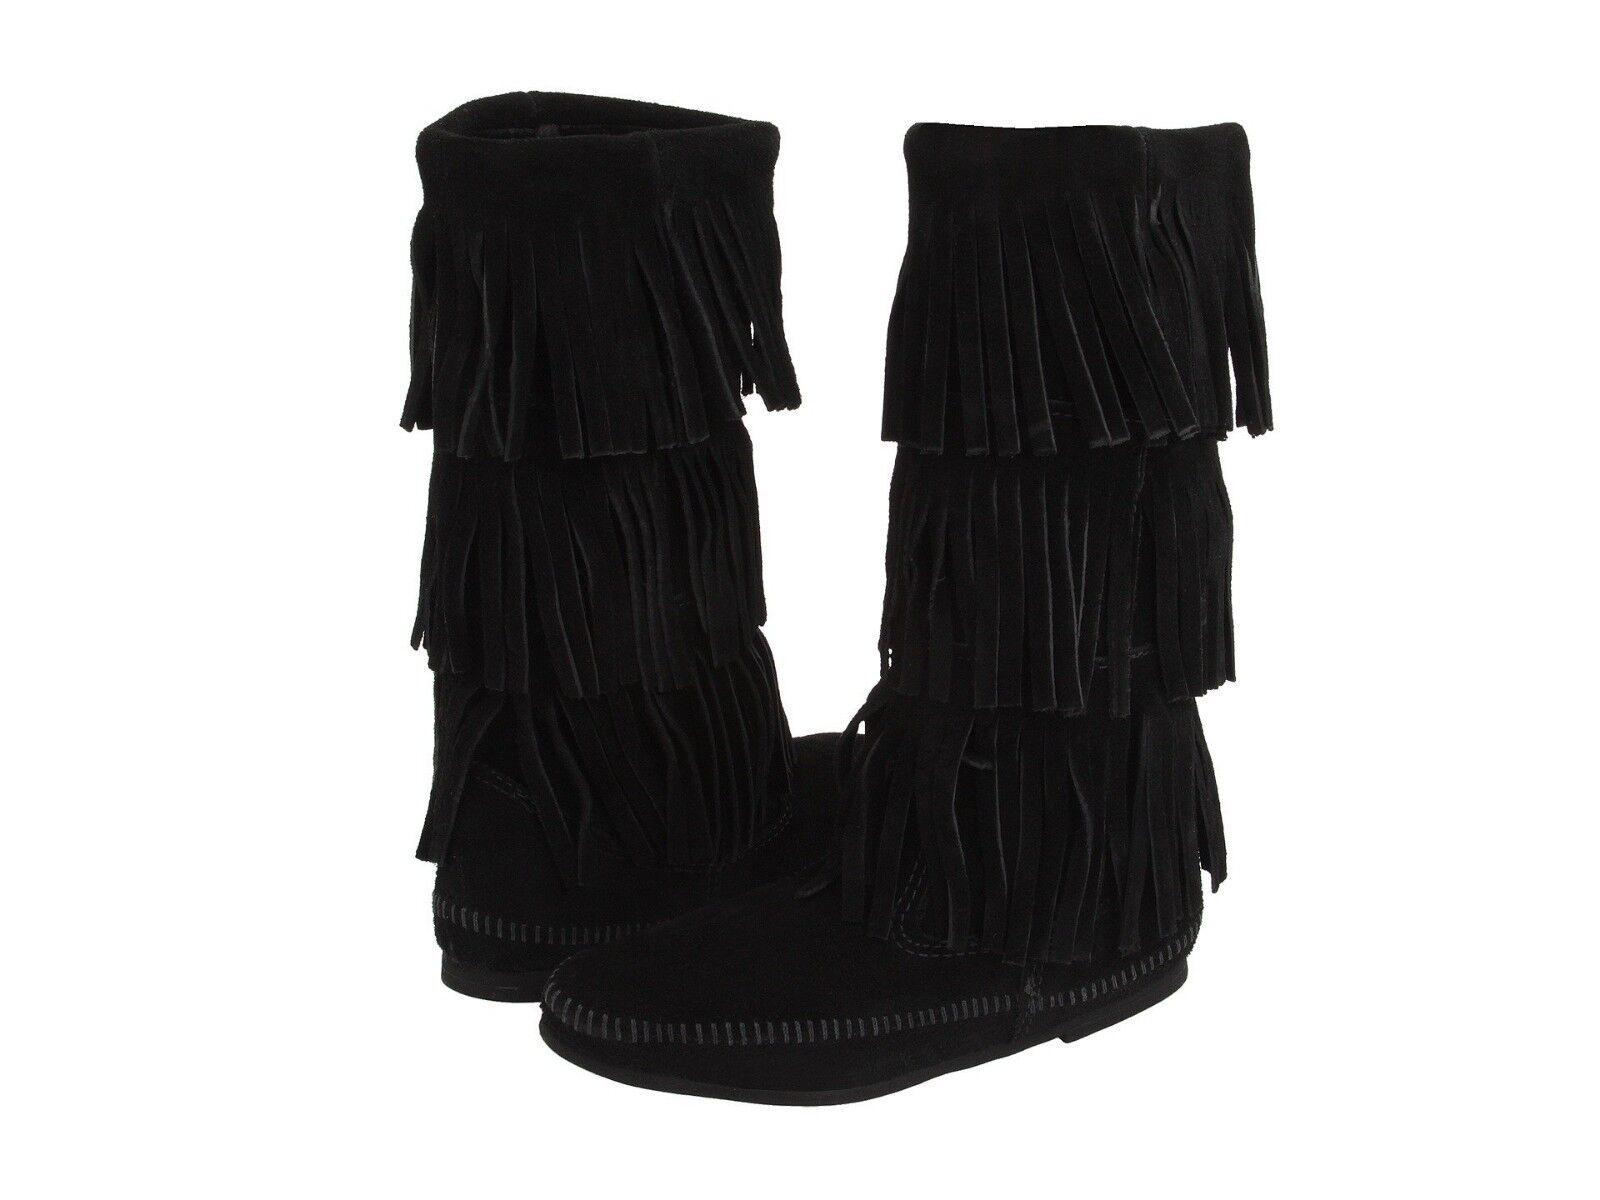 NIB MINNETONKA Calf Hi Hi Hi Black 3 Layer Triple Fringe BOOTS 7 New Celeb Favorite 9d05ce